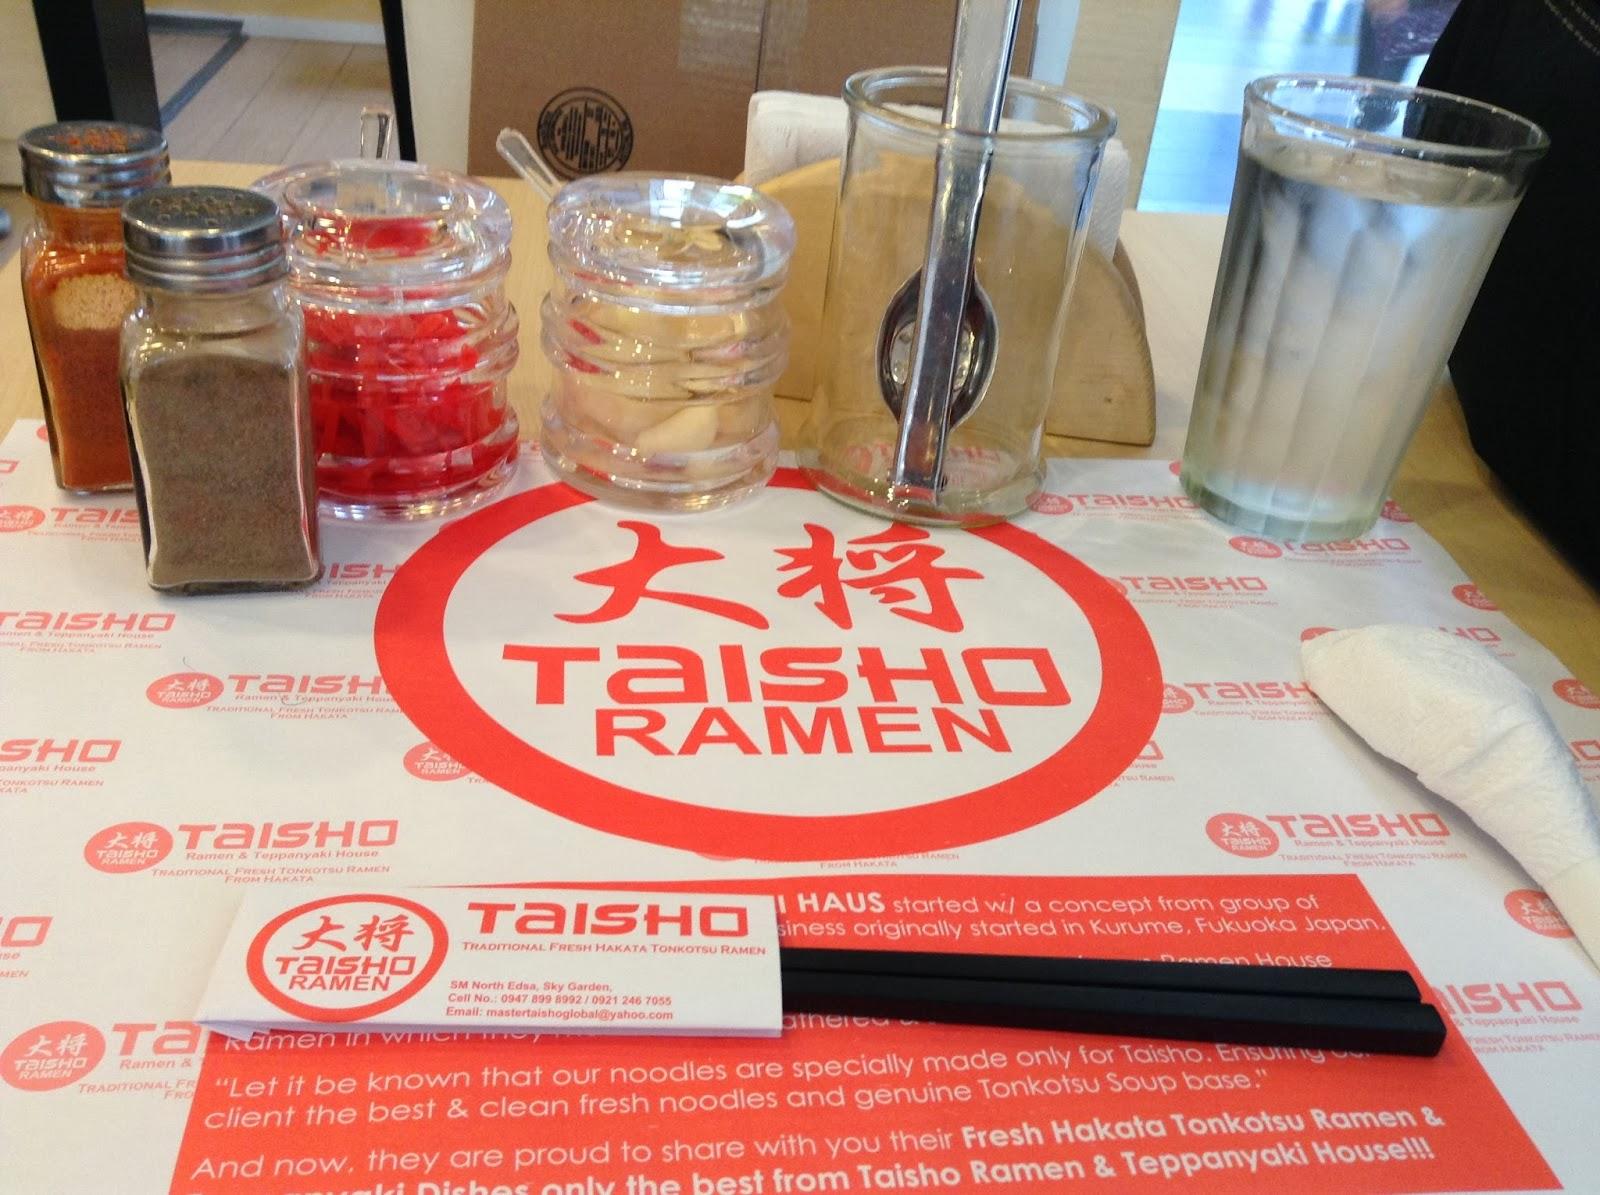 Taisho ramen paper placemat